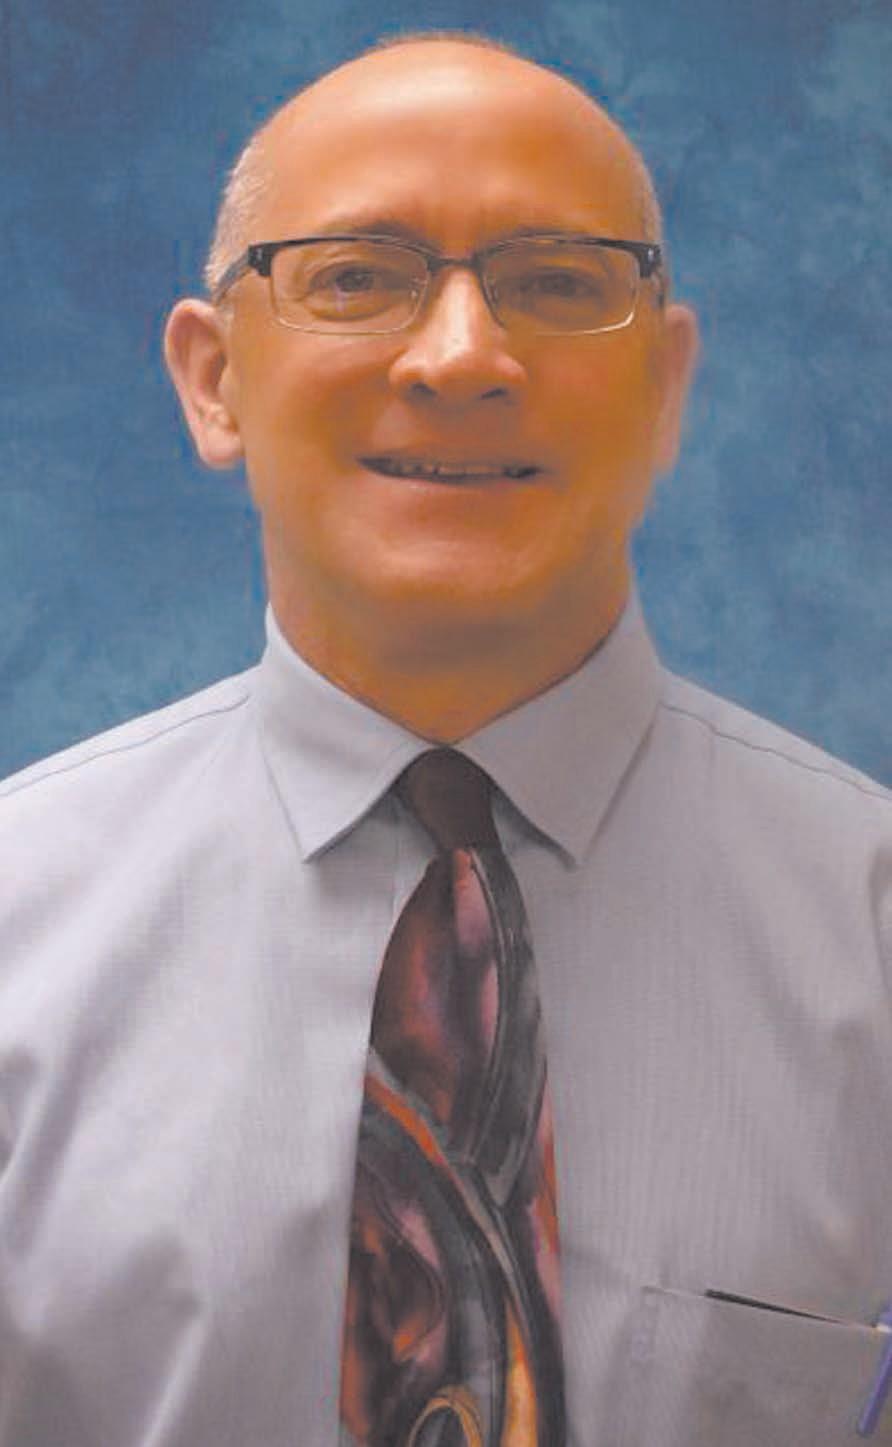 Dr. Patrick J. Nunan